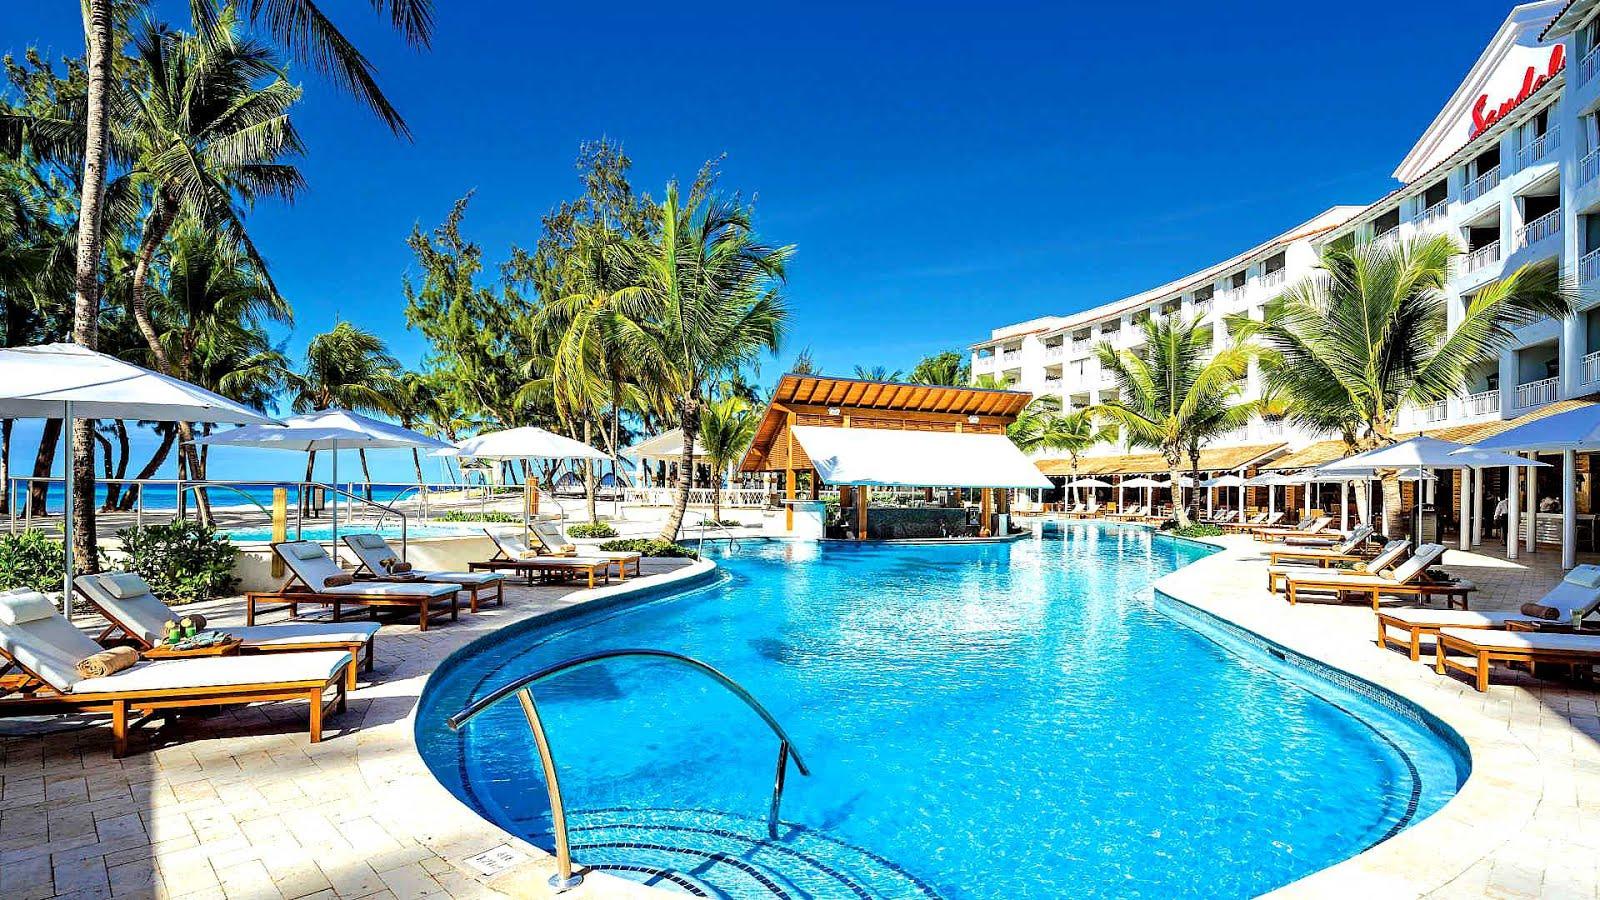 Paradise Hotel Golf Resort And Spa Barbados - Trip to Resort